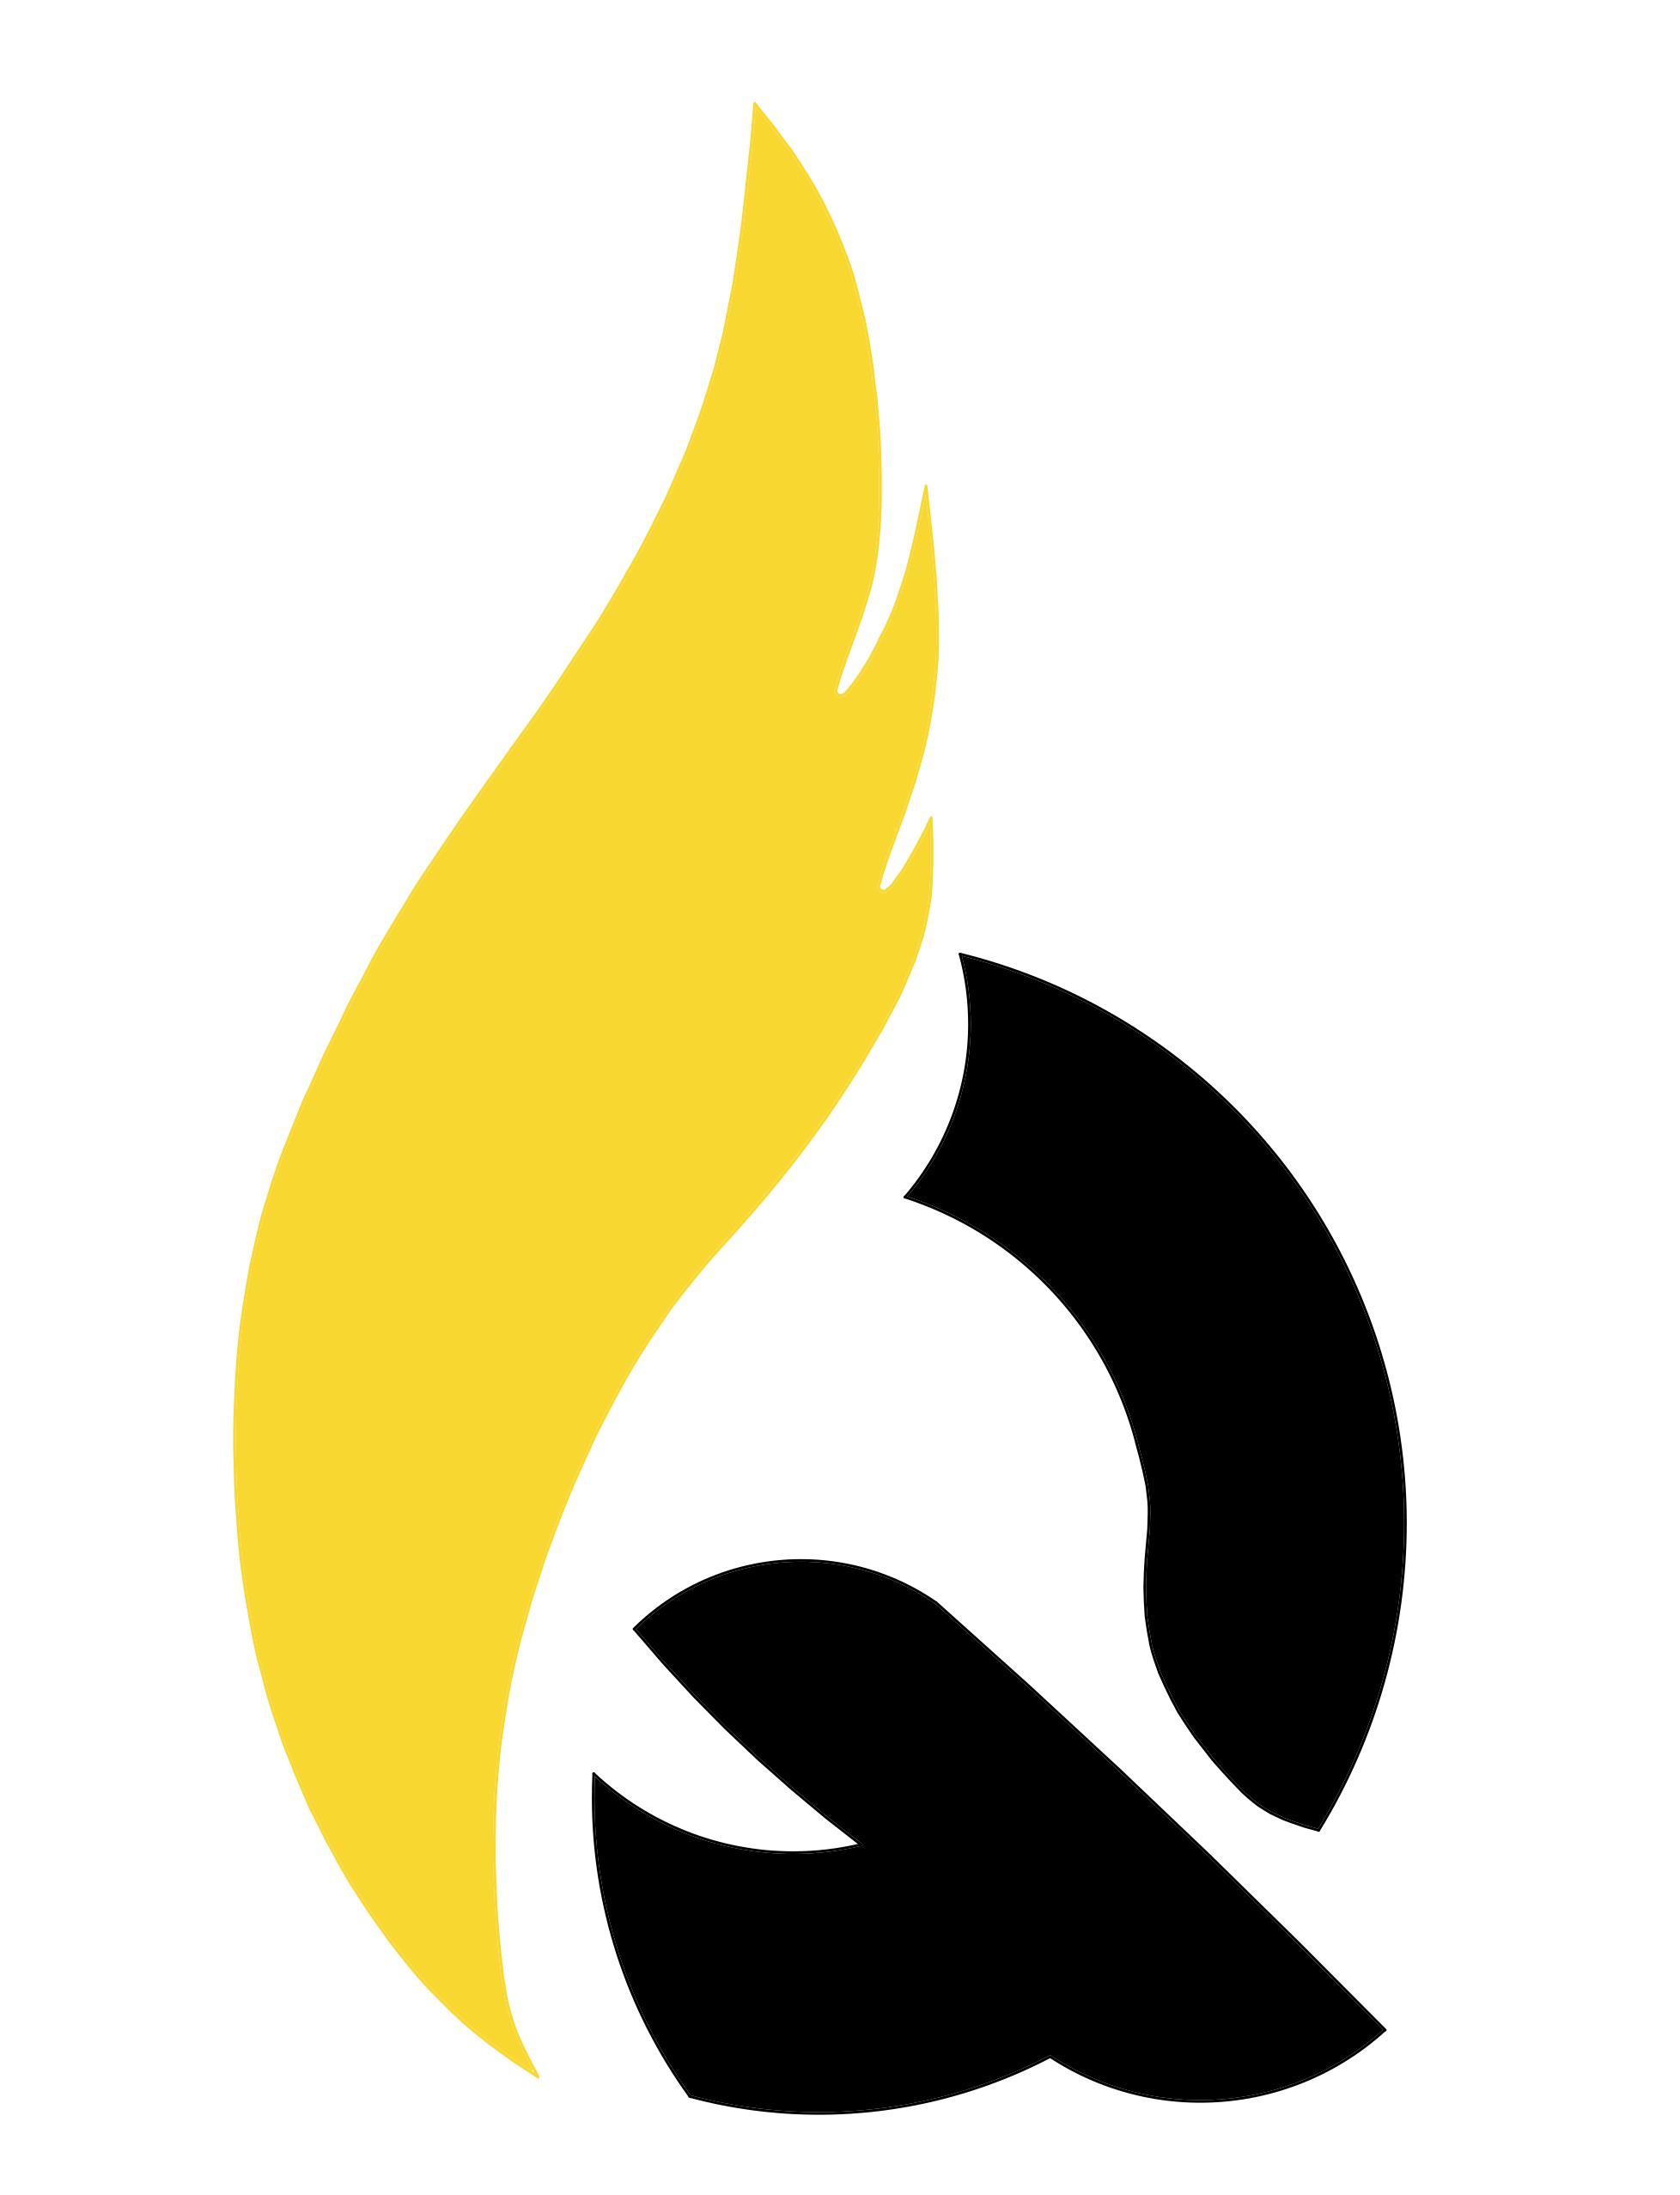 bpttq-logo-01